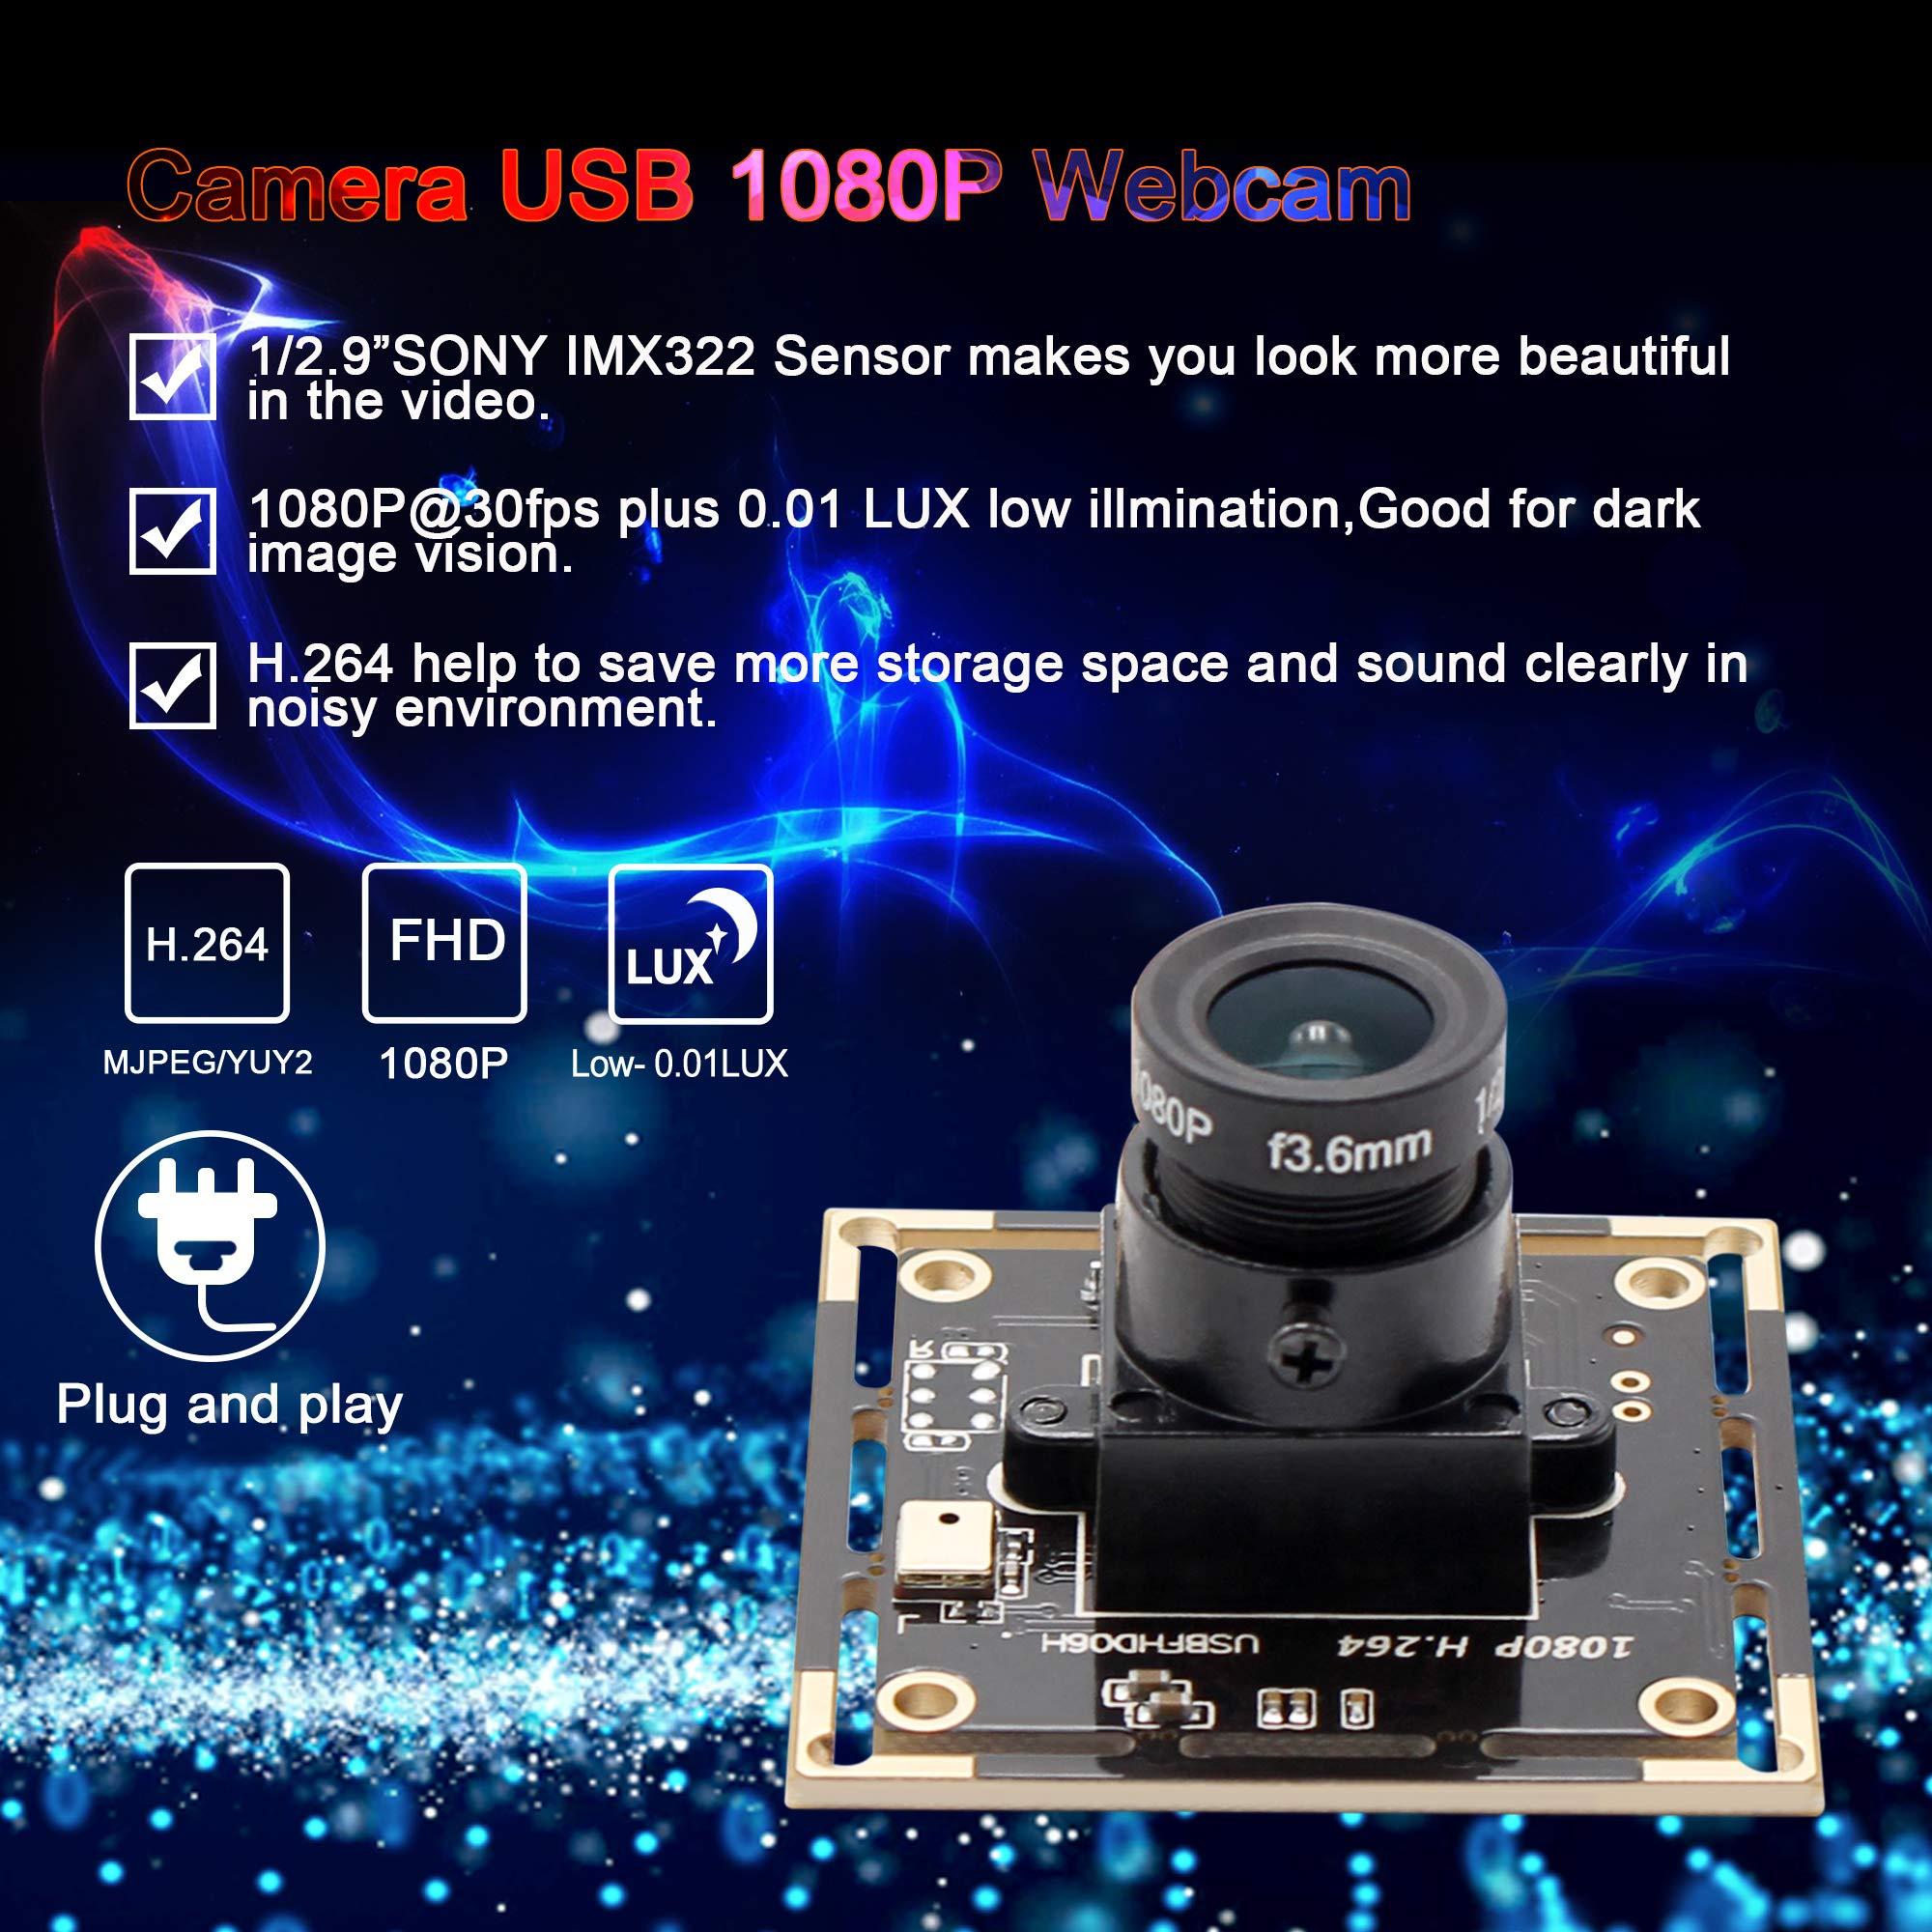 Camera USB 1080P USB Webcamera Sony IMX322 Sensor Webcam 0.01lux Low Illumination 2MP USB Camera Module 3.6mm Mini Video Camera Wide Angle Industrial Camera for Android Windows Linux PC Mac